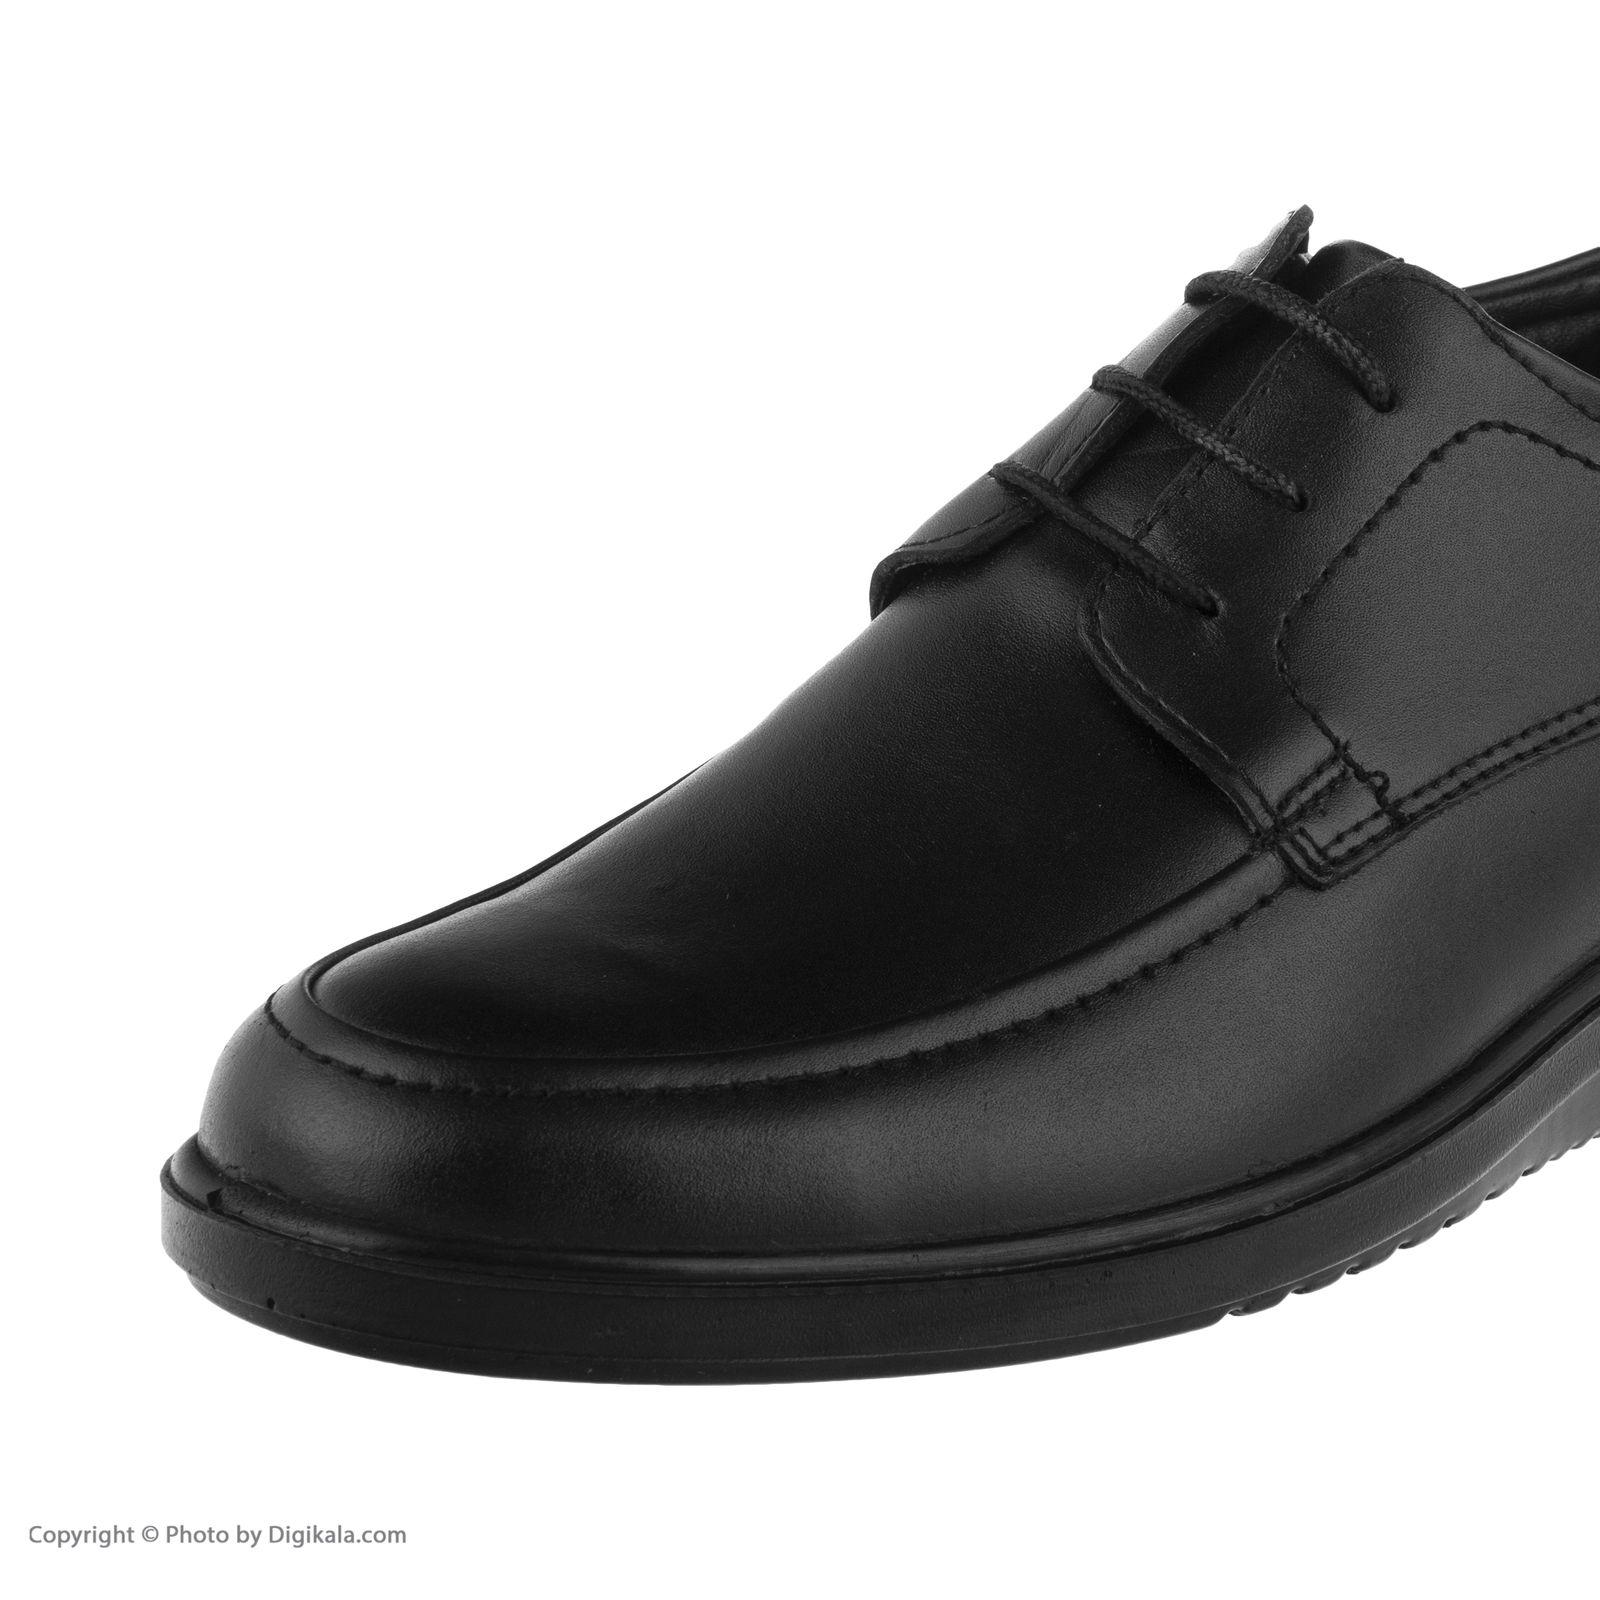 کفش روزمره مردانه سوته مدل 4994E503101 -  - 7